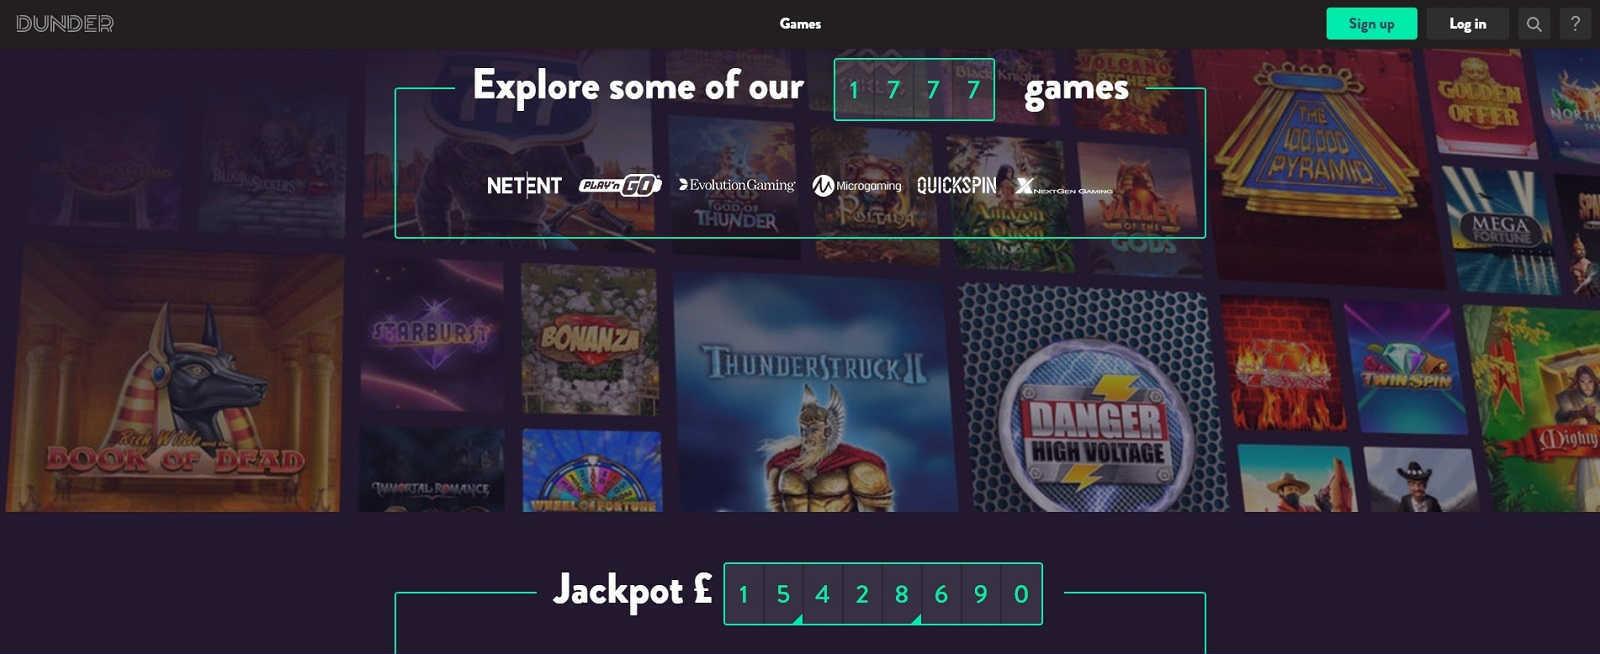 Dunder Casino Online Casino Games